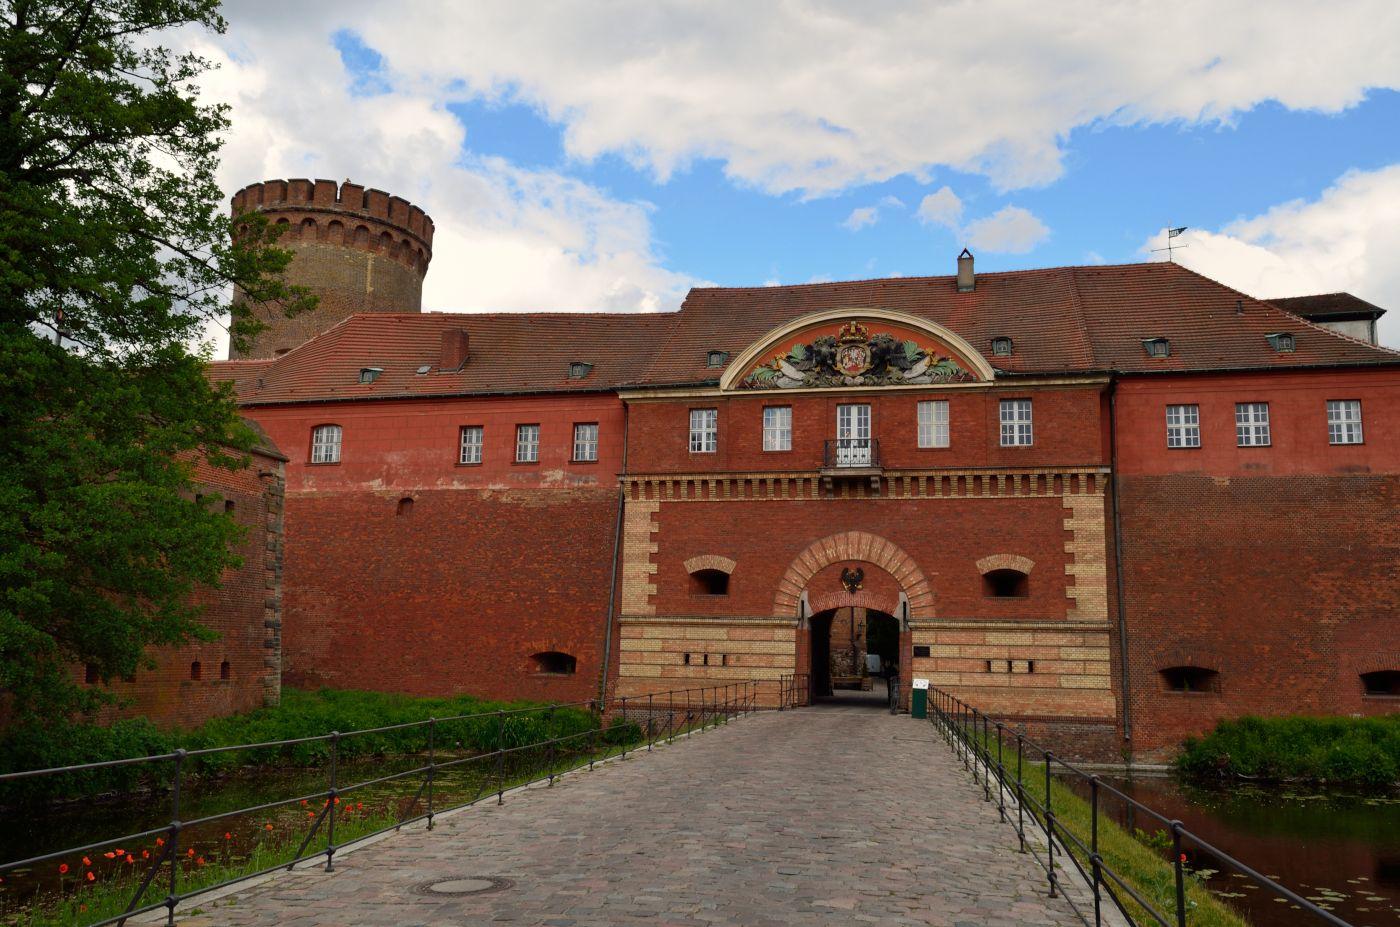 Spandau Citadel (Zitadelle Spandau) a 16th-century